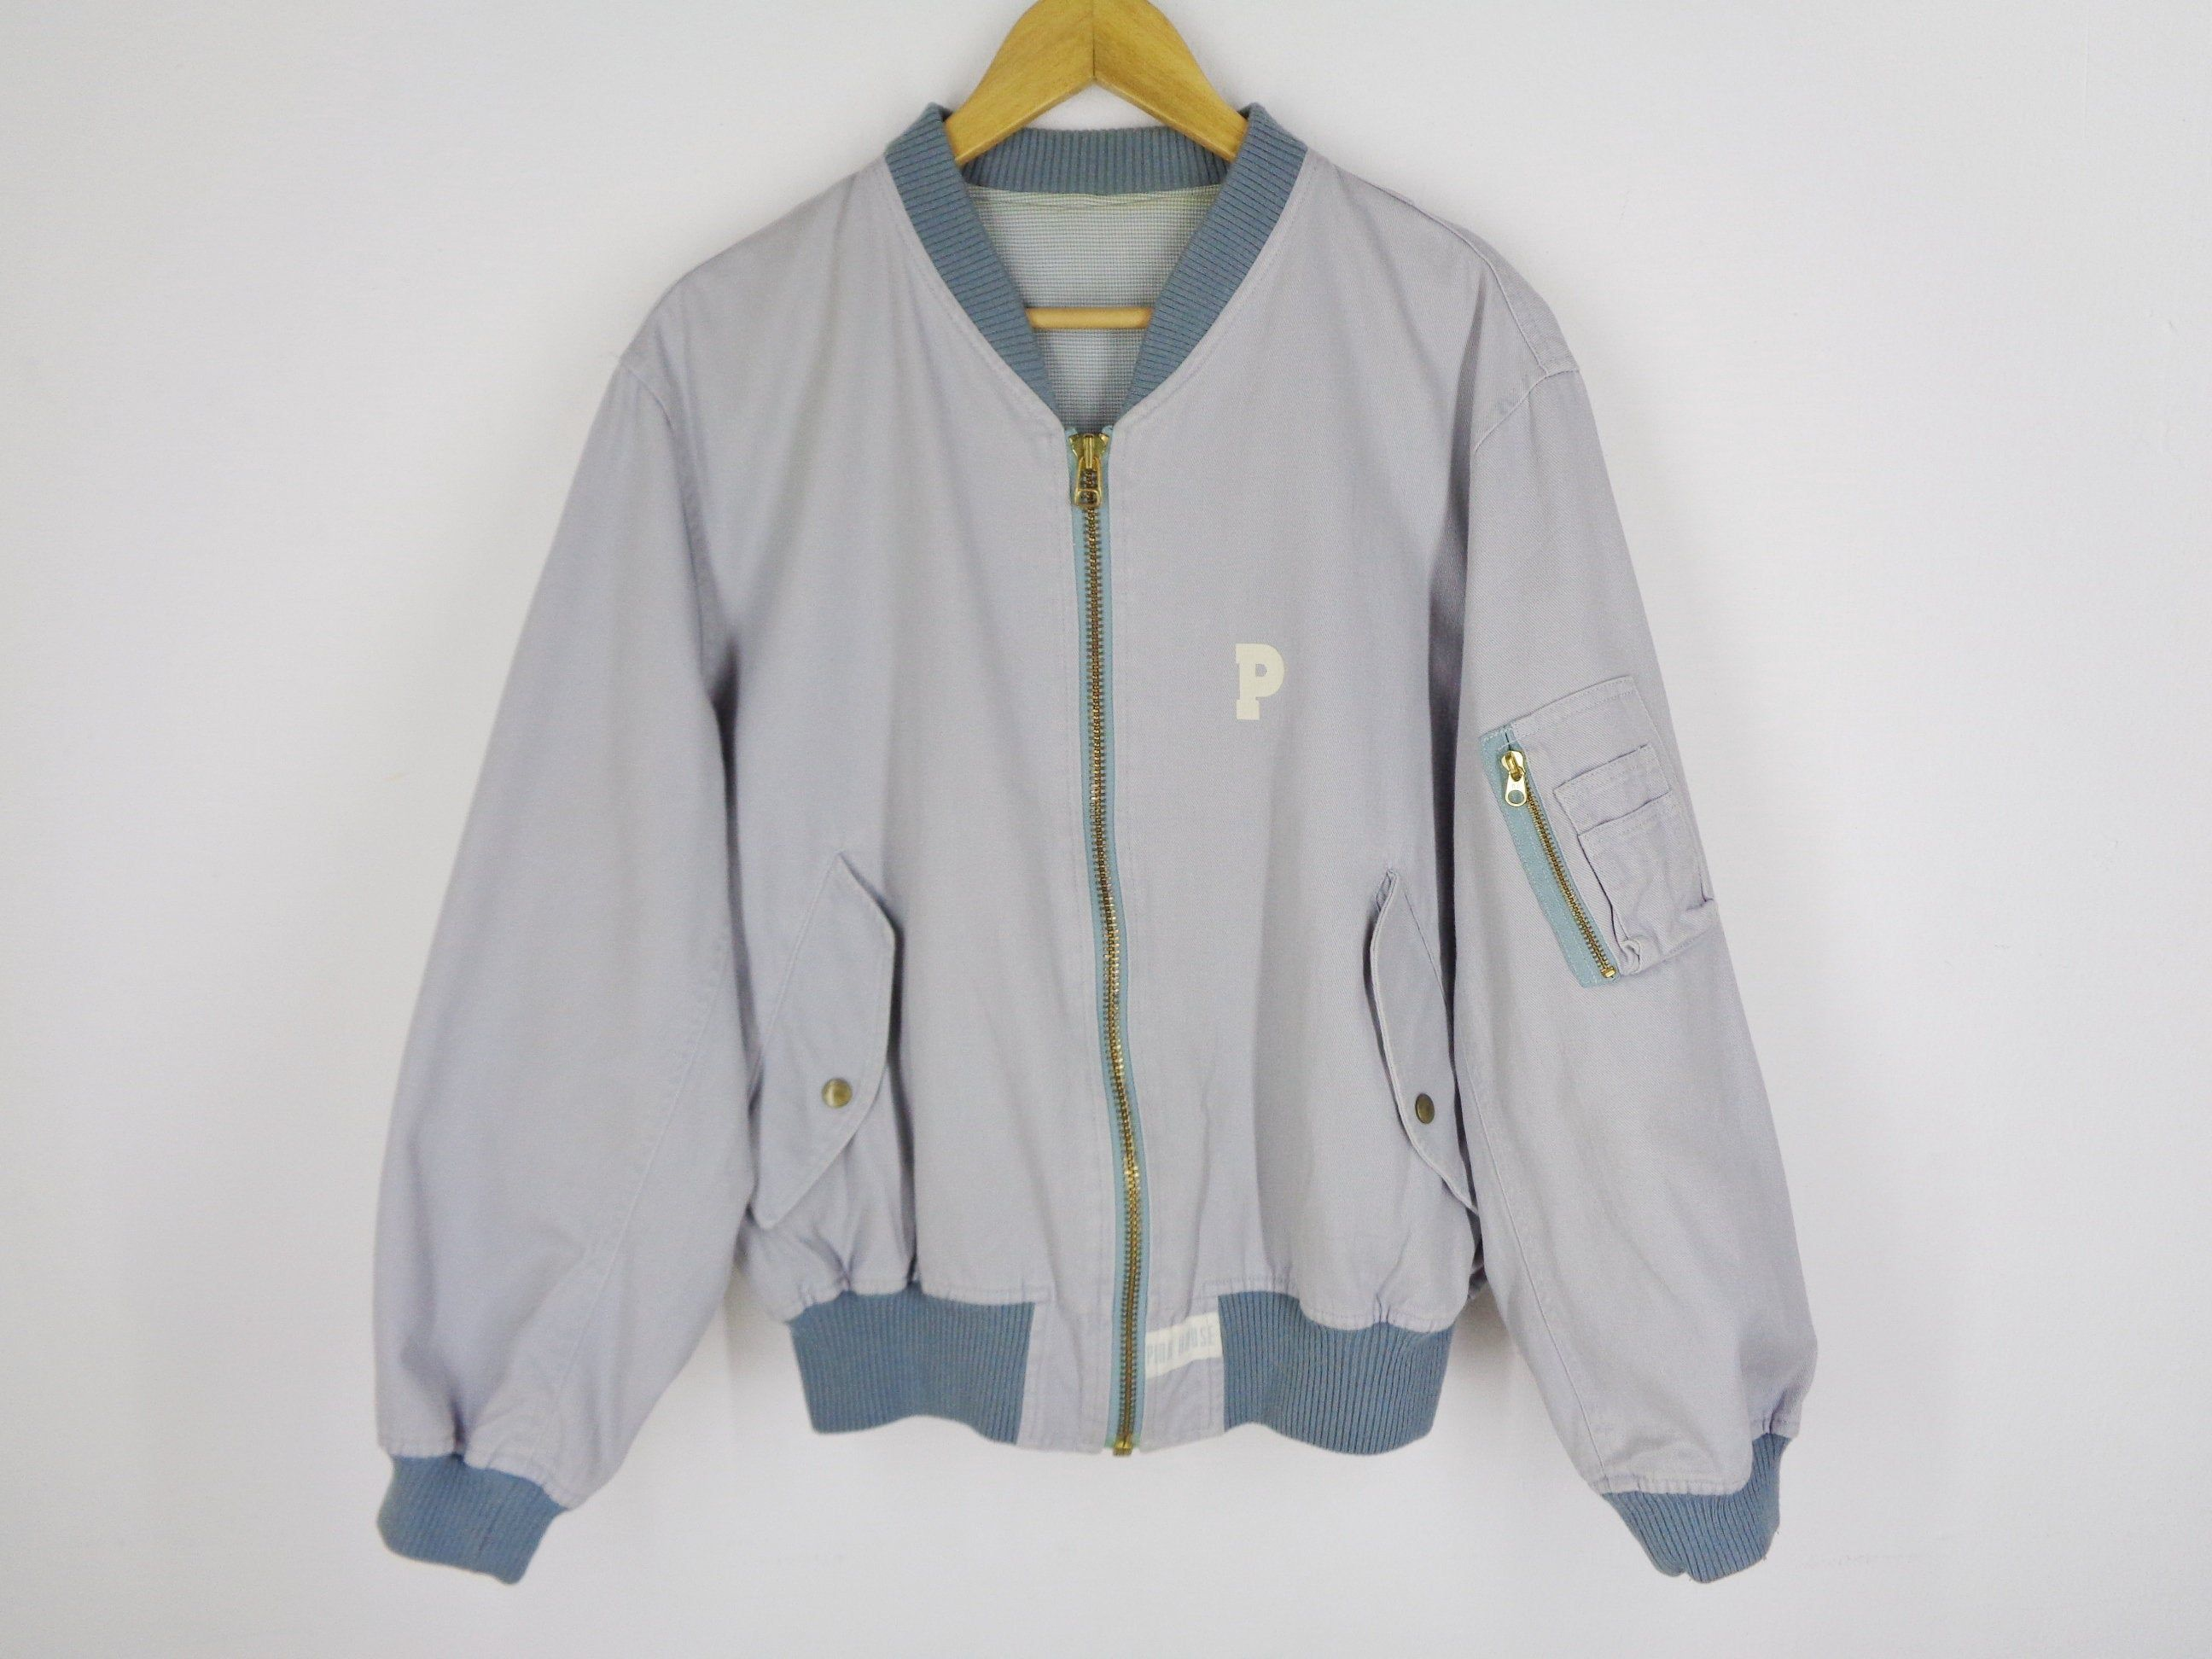 NIKE windbreaker vintage 90s jacket old school